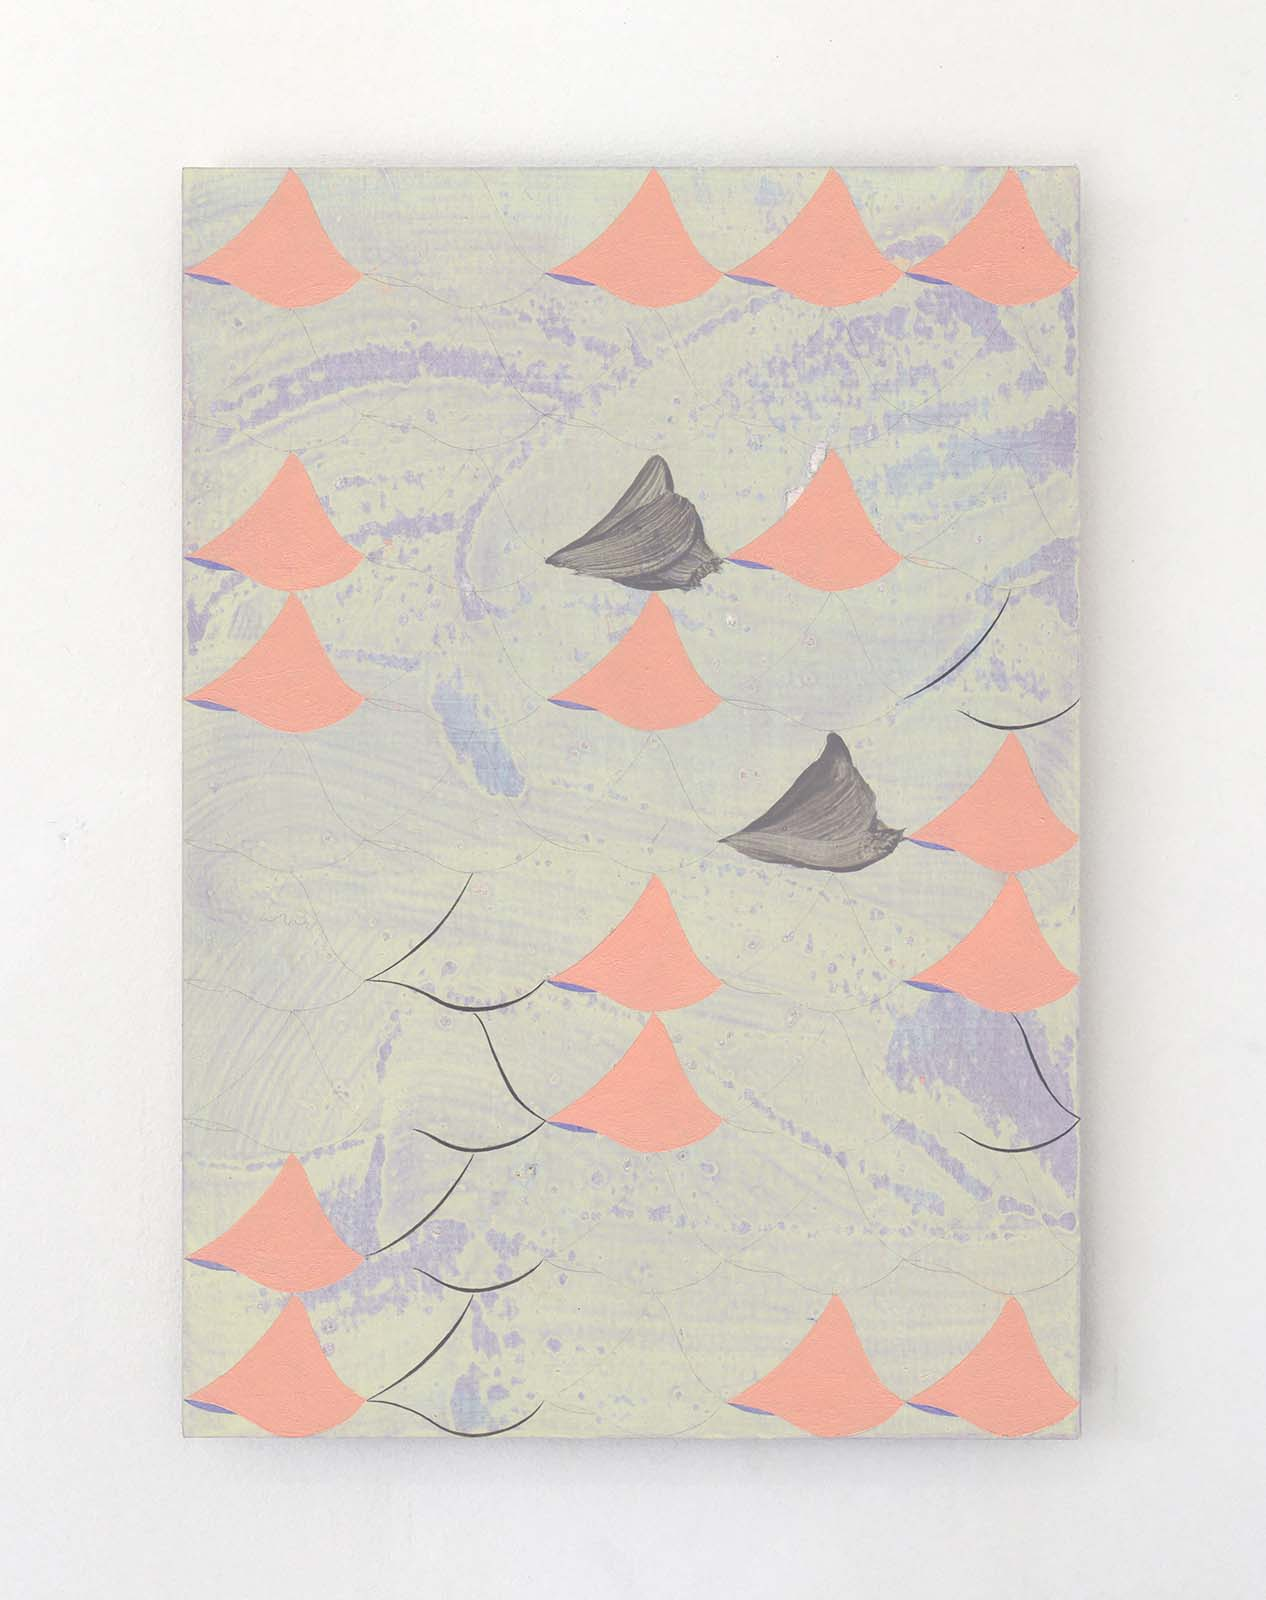 Jinyong Park, laim, acrylic on paper, 29.7 x 21 cm, 2019